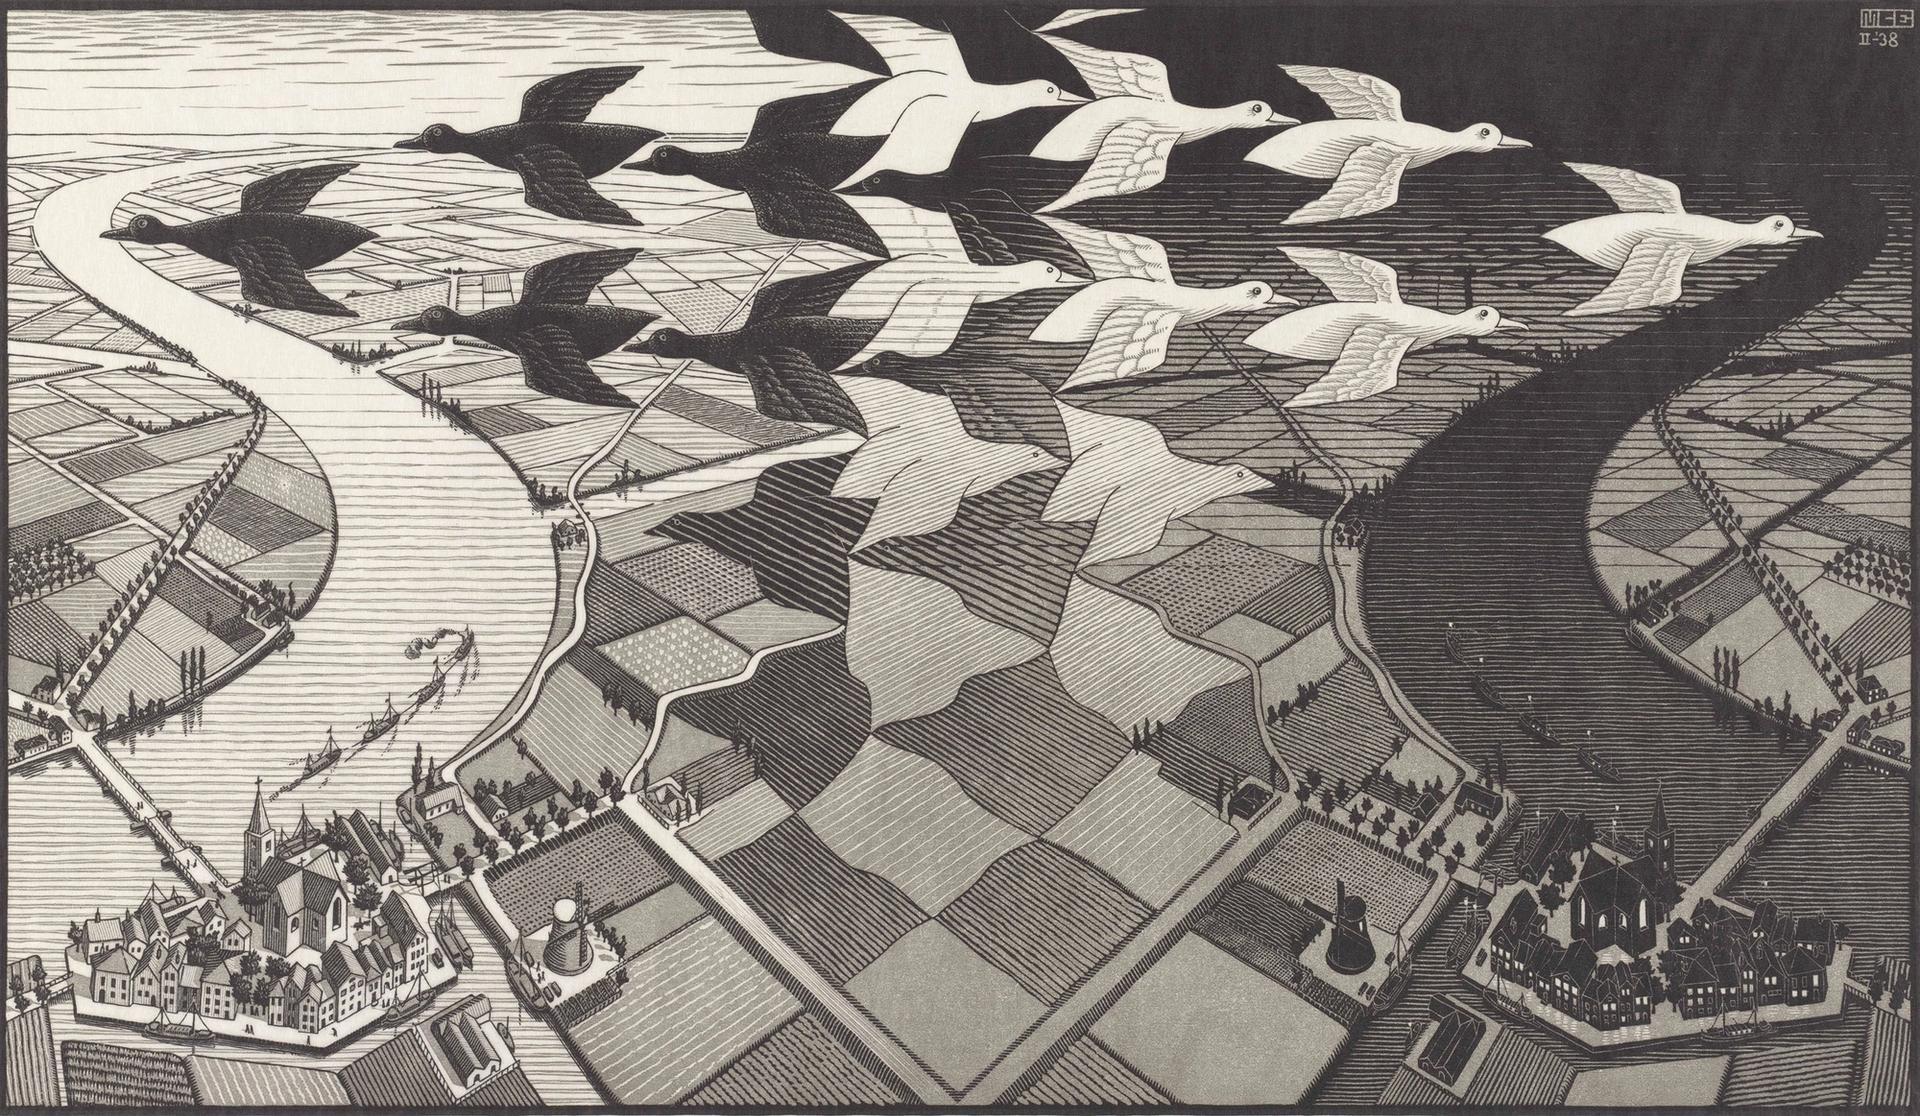 M.C. Escher's Day and Night (1938) The M.C. Escher Company